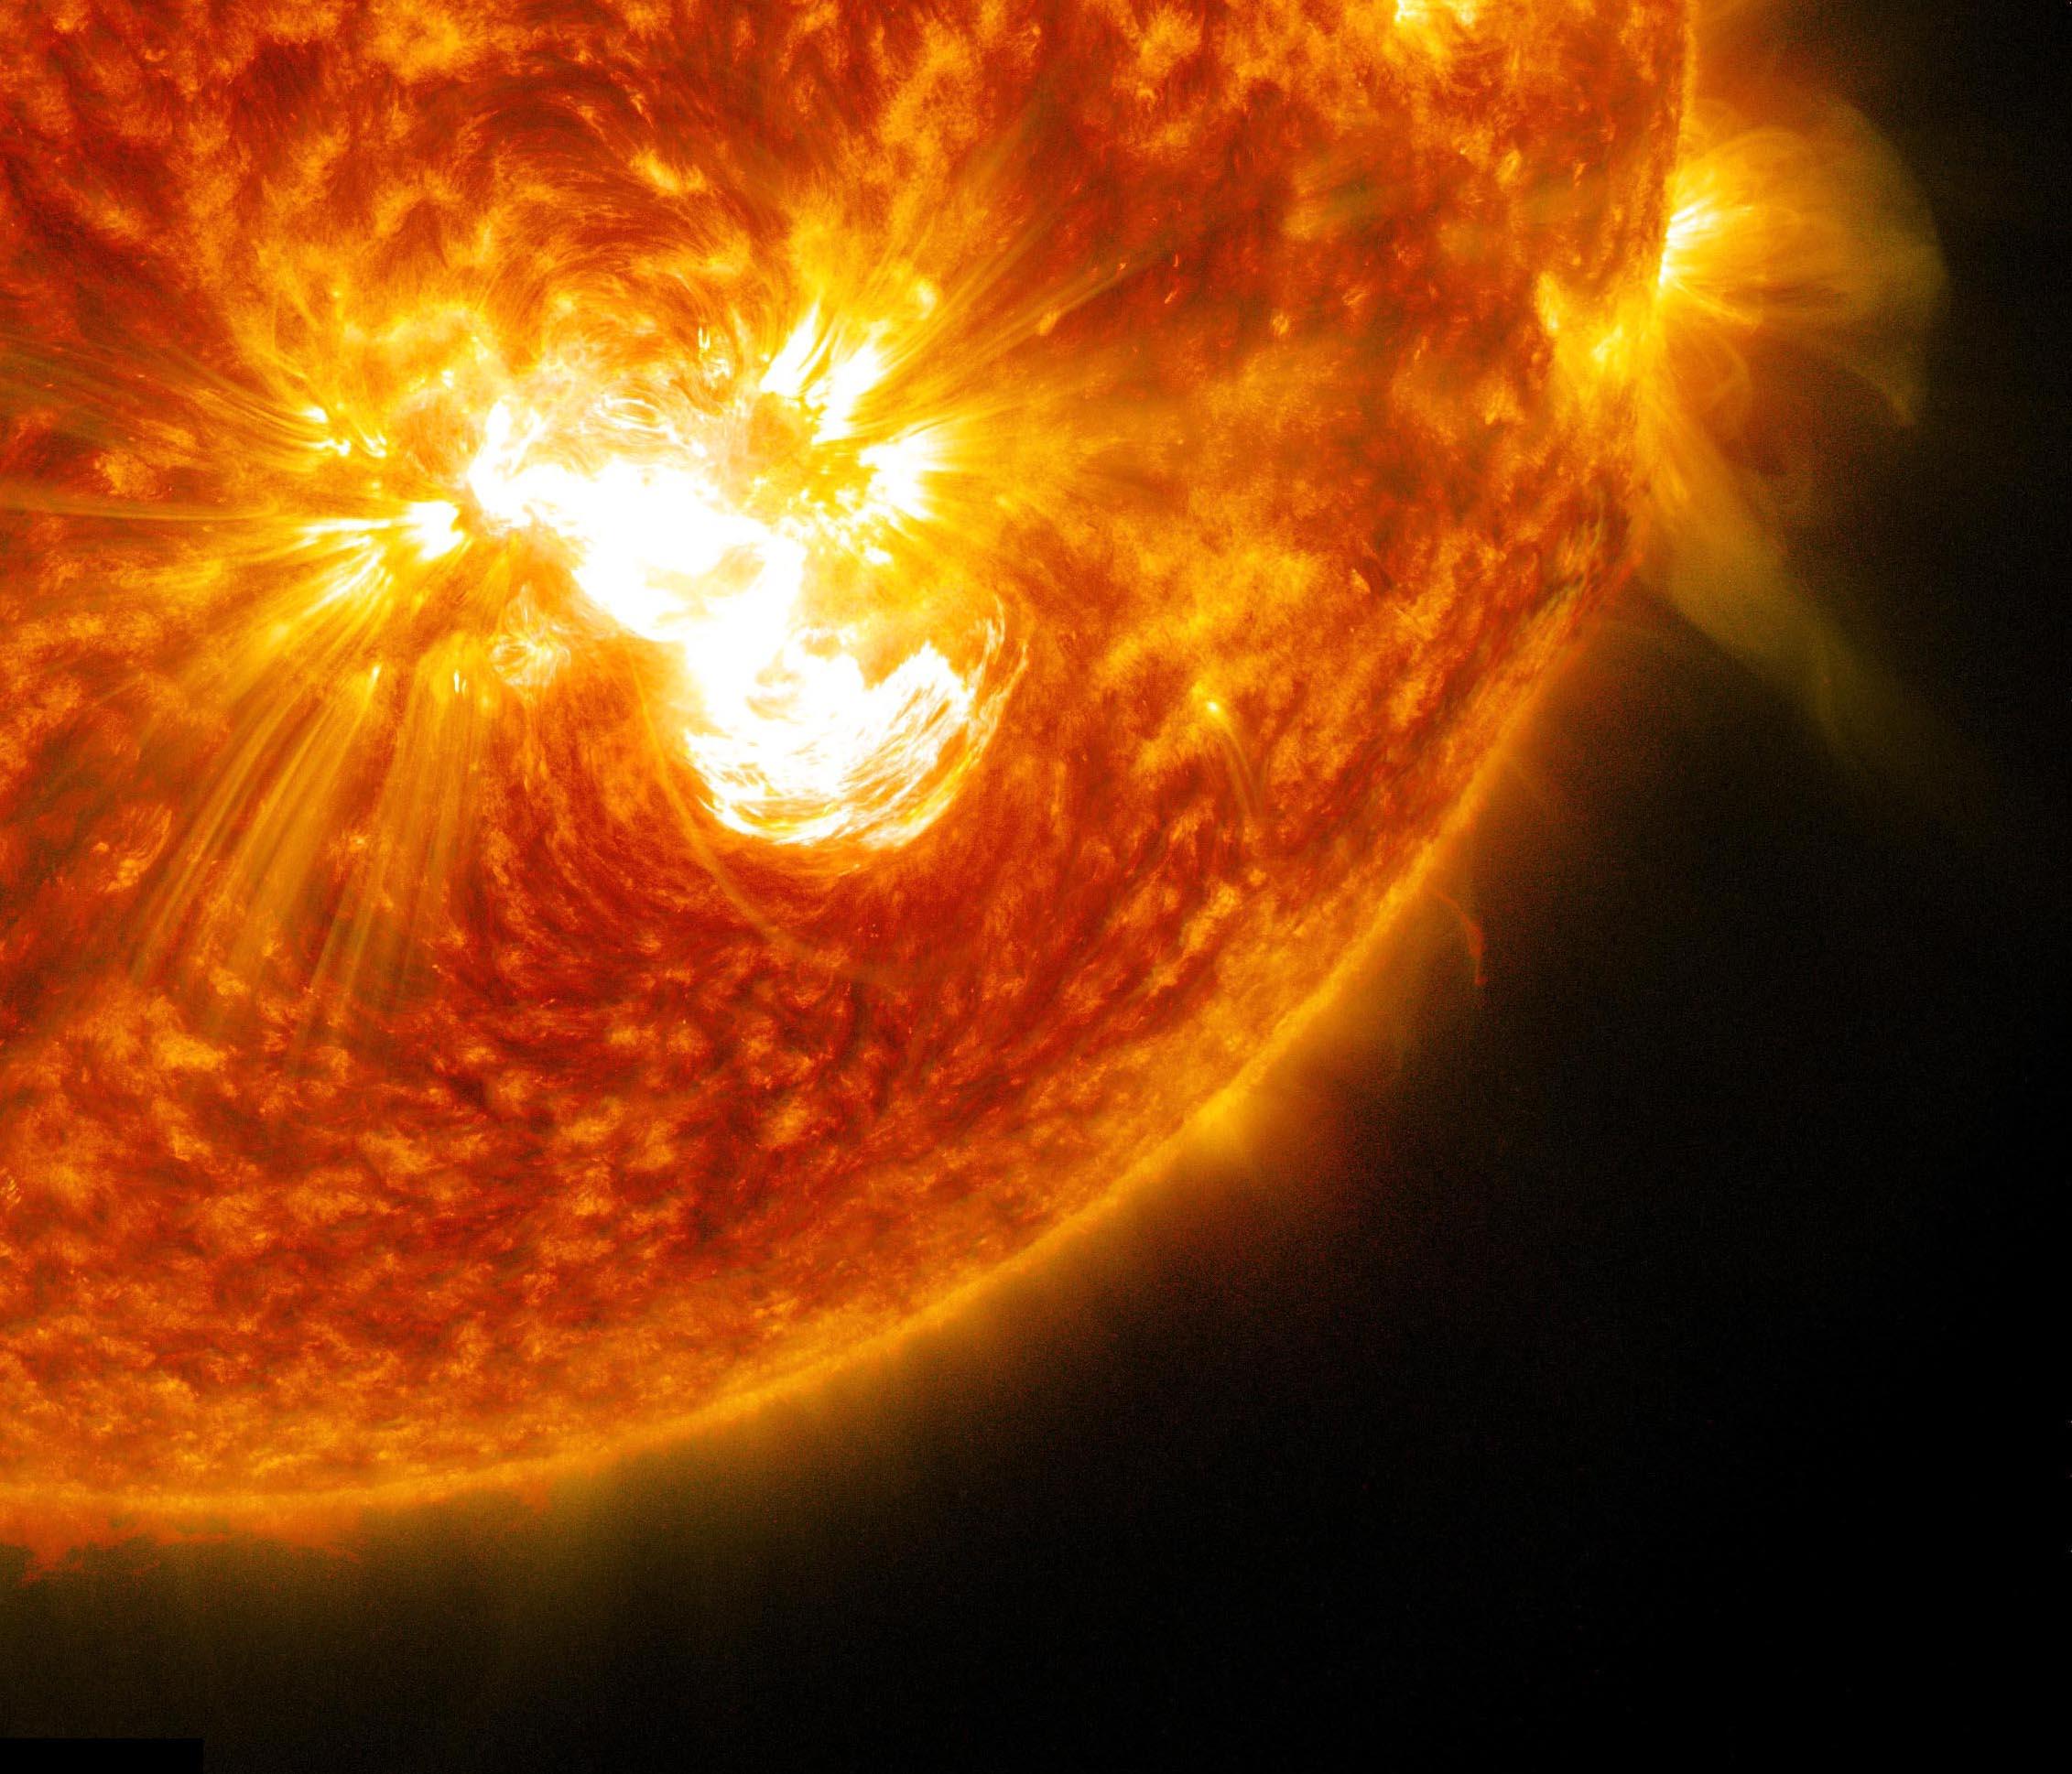 X3.1 Solar Flare of Oct. 24, 2014